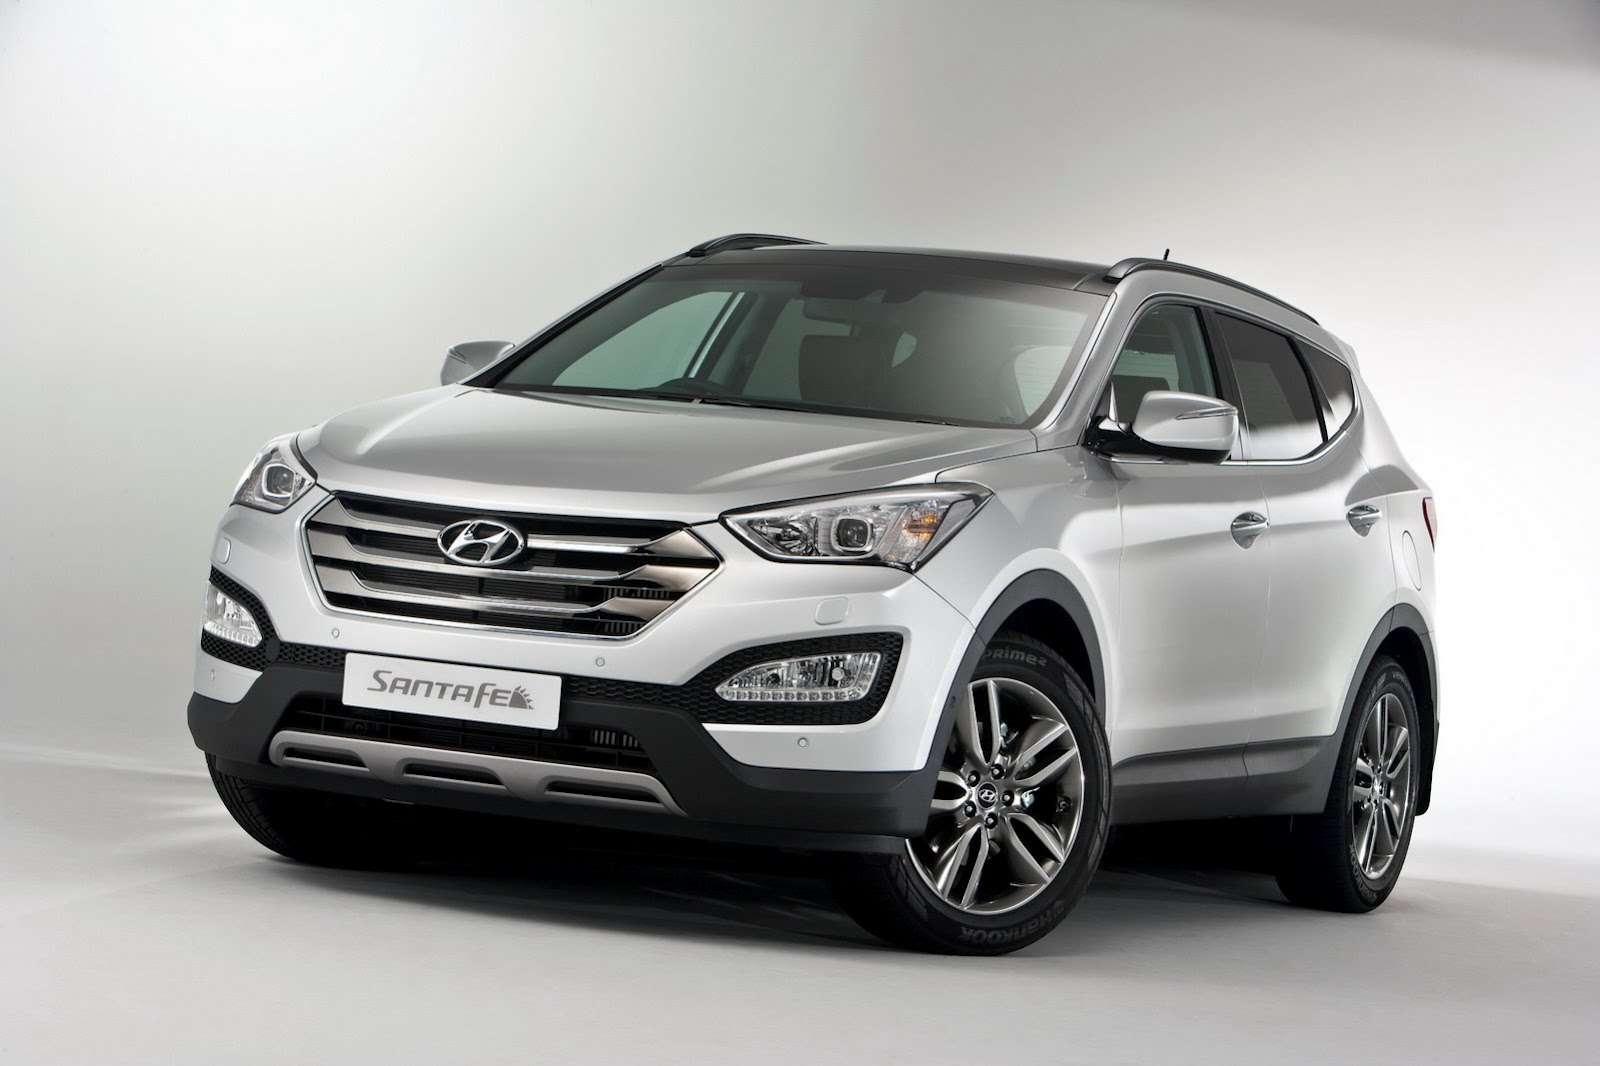 Hyundai Santa Fe 2013 europejska wersja